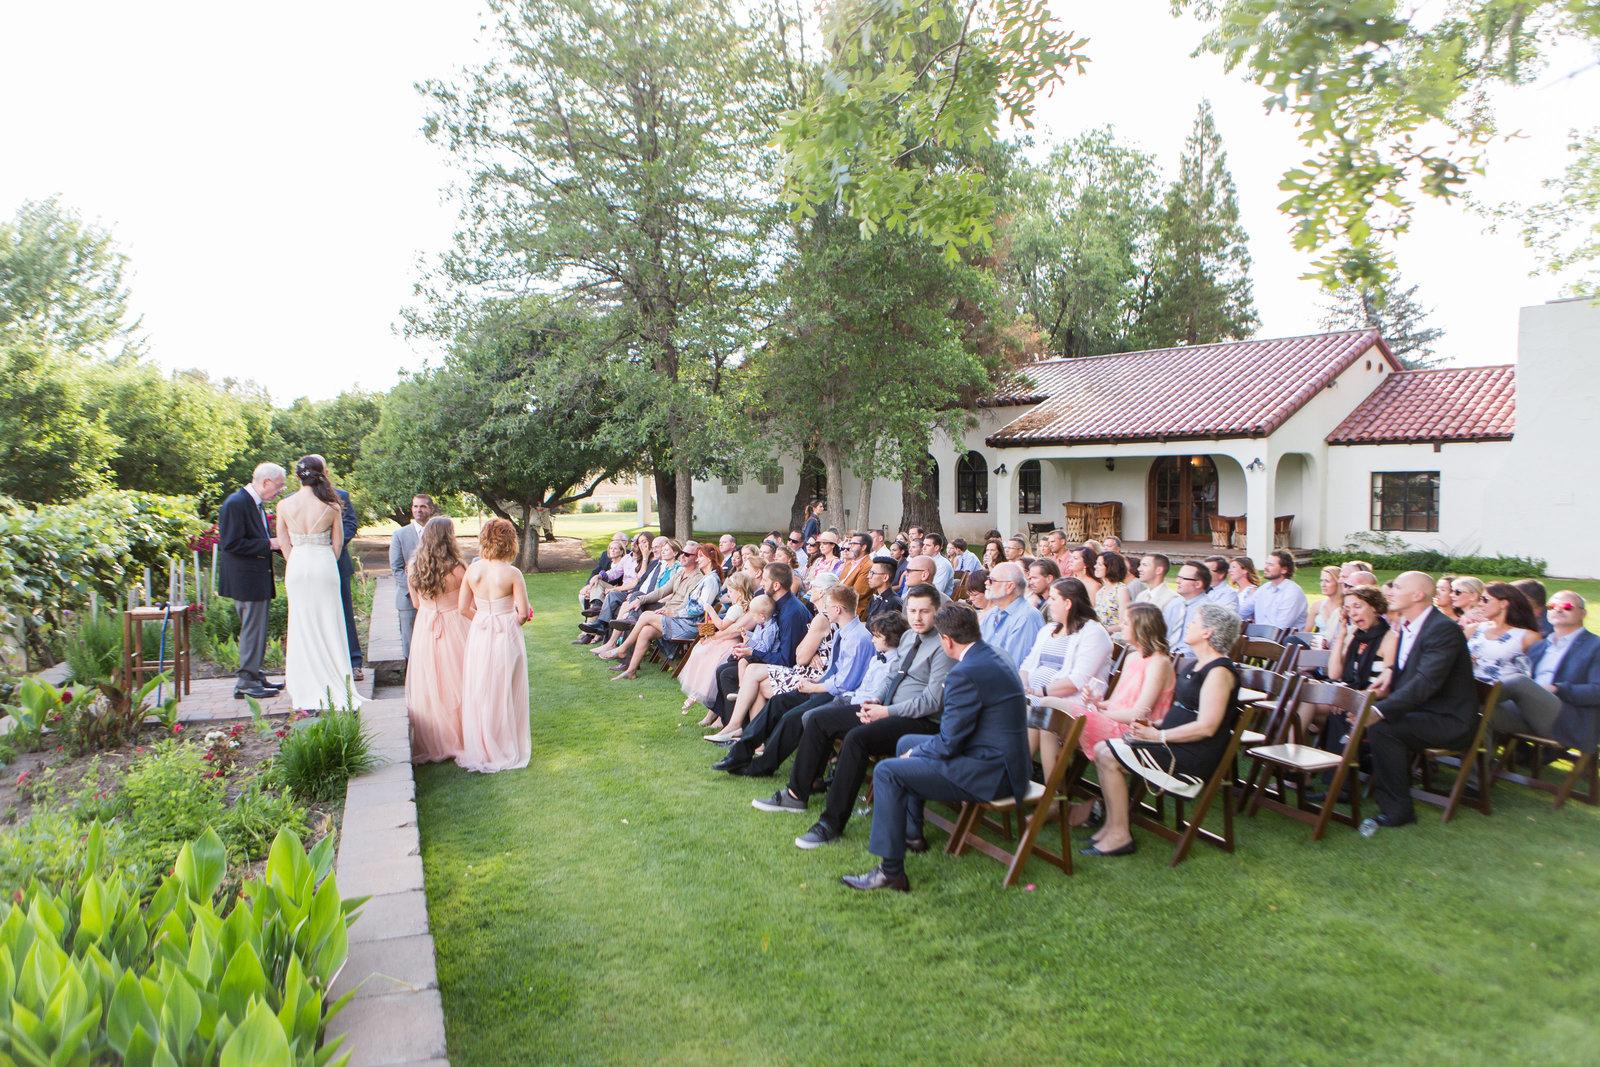 Desert Oasis Wedding  |  Round Lens PhotographyJune123